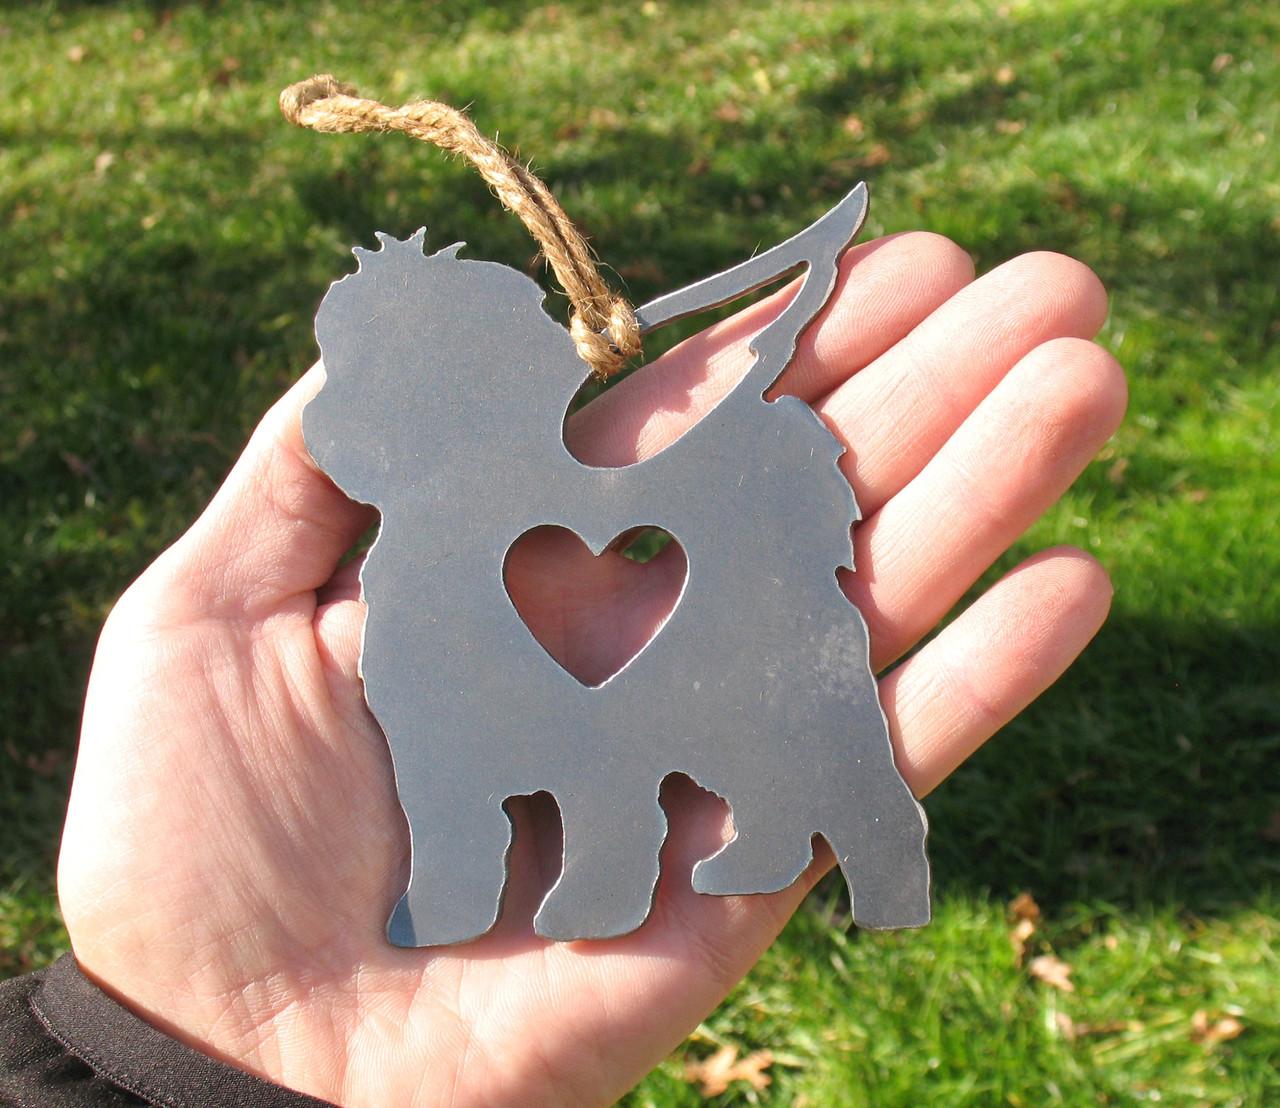 Maltese Dog 2 Pet Loss Gift Ornament Angel - Pet Memorial - Dog Sympathy Remembrance Gift - Metal Dog Christmas Ornament